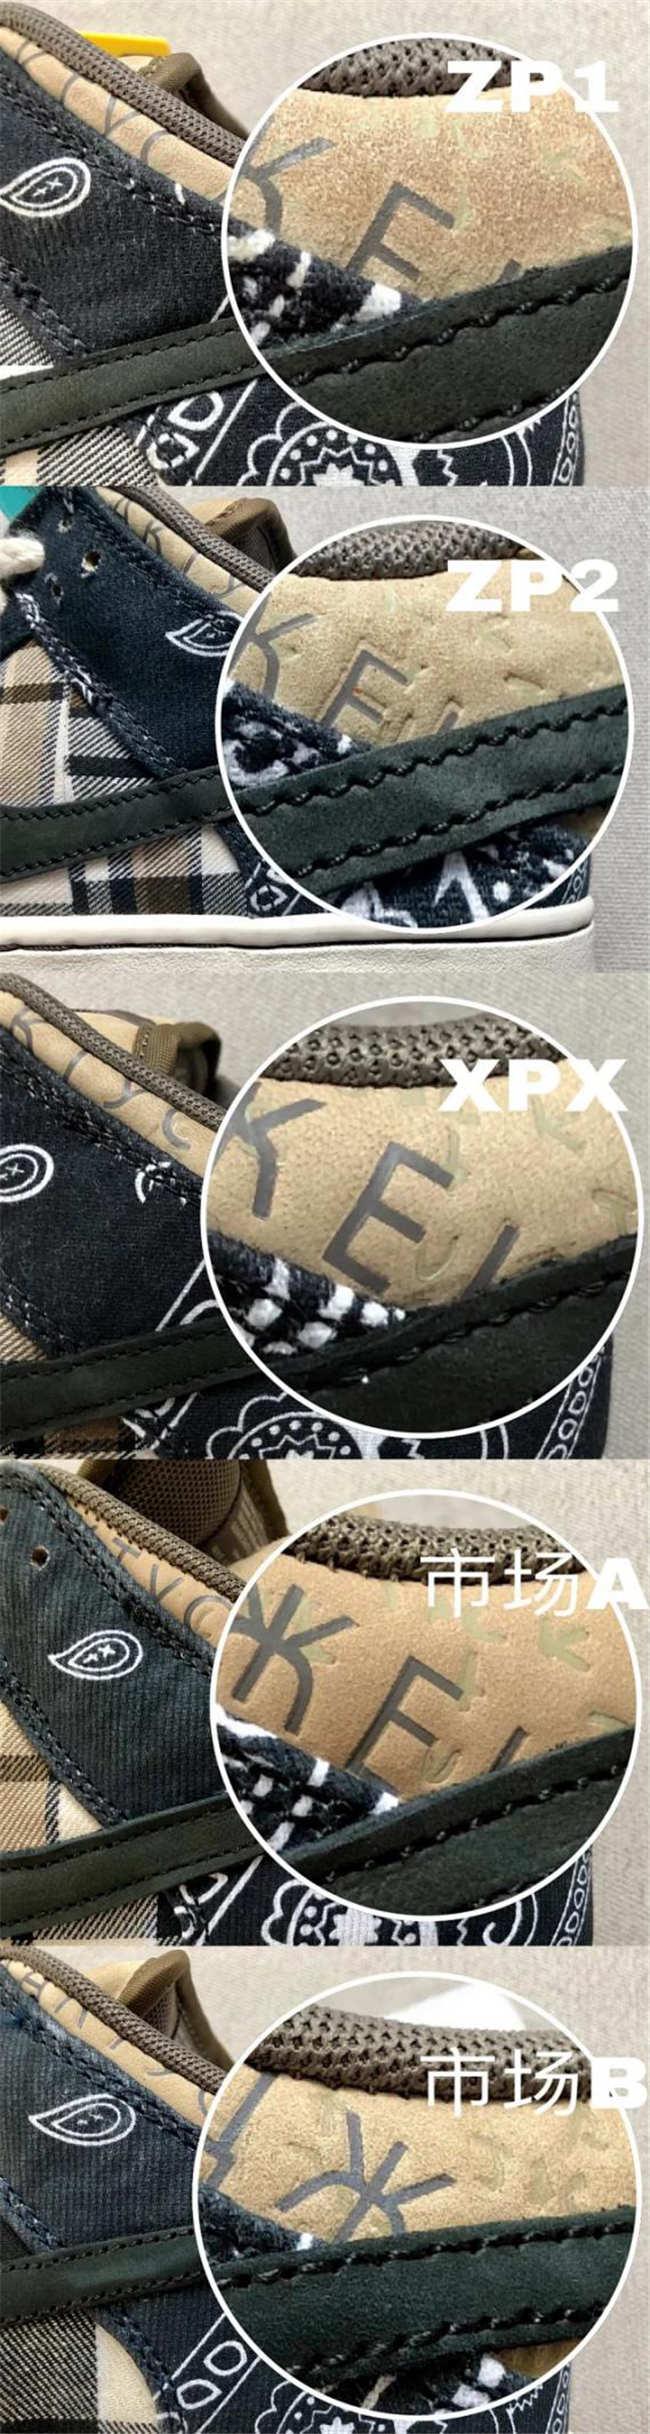 TS Nike sb dunk腰果花真假對比 nike腰果花怎么撕